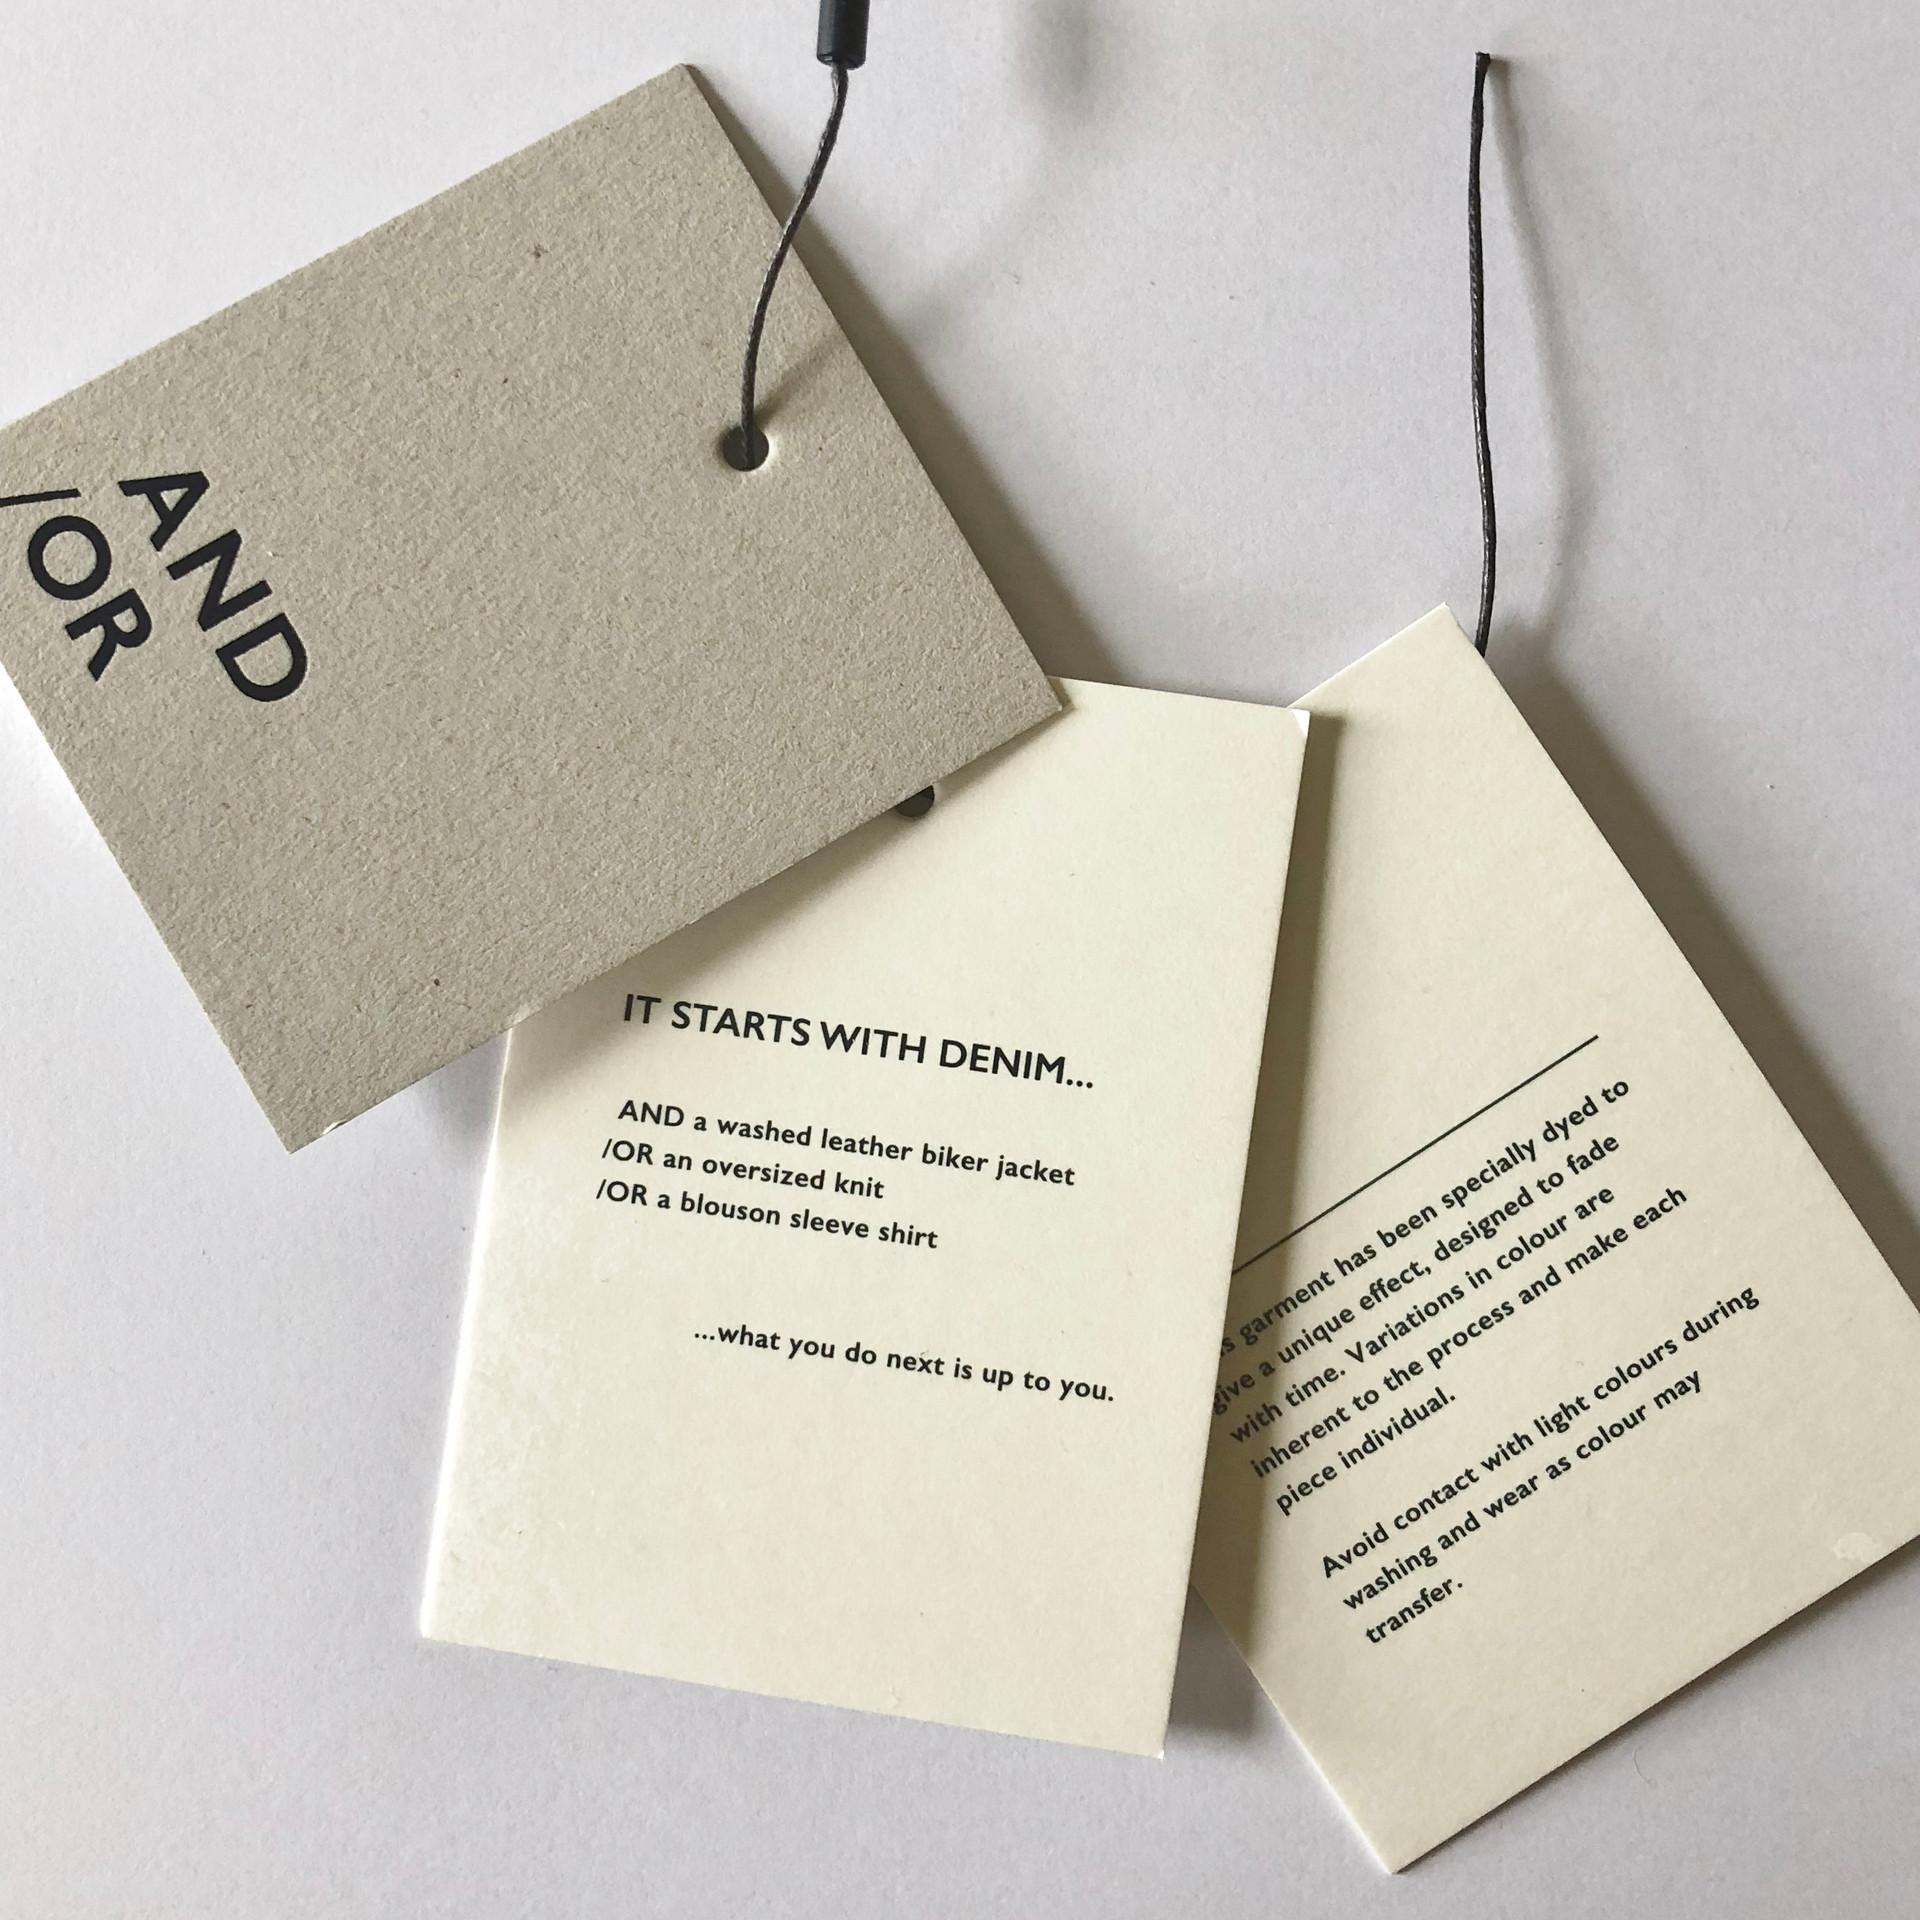 ANDOR brand launch copywriting tags 2.jp